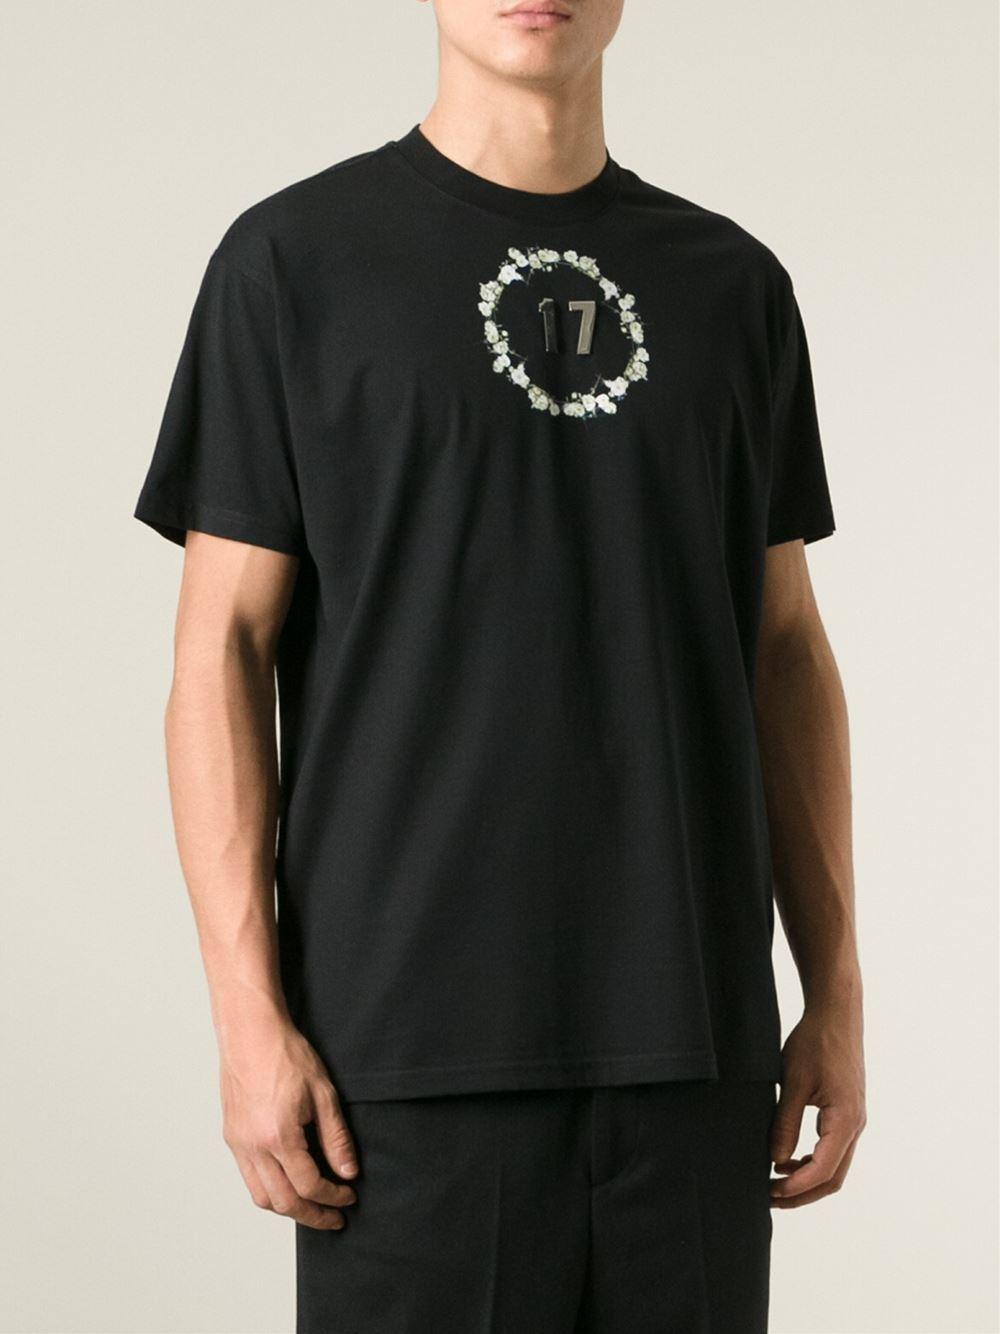 givenchy 39 39 17 39 removable metal plate floral crown t shirt in black for men lyst. Black Bedroom Furniture Sets. Home Design Ideas